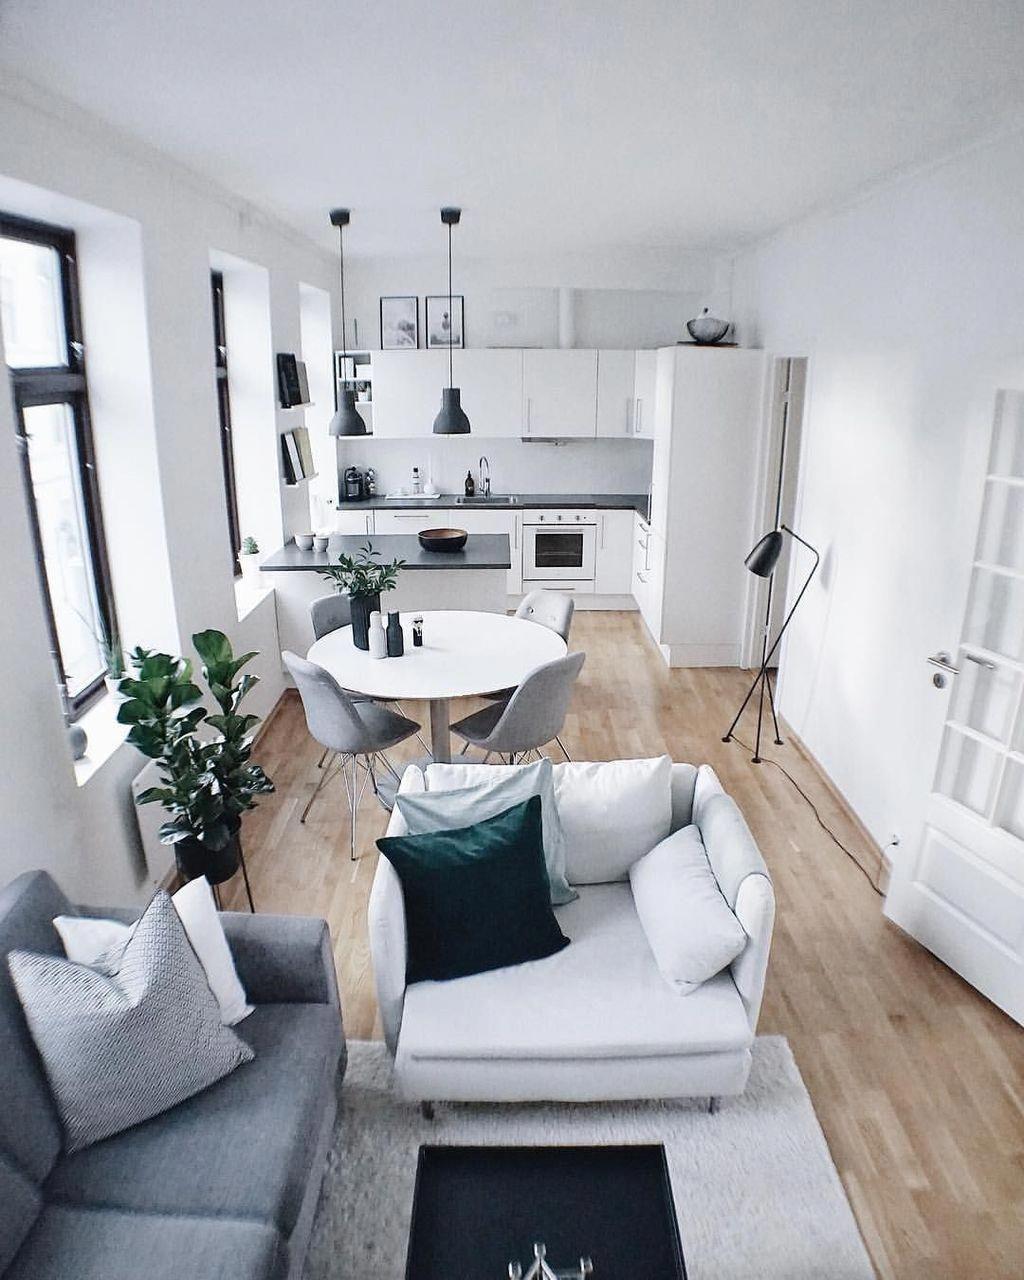 Livingroomdecorwall Small Apartment Design Interior Design Apartment Small Small Living Room Design